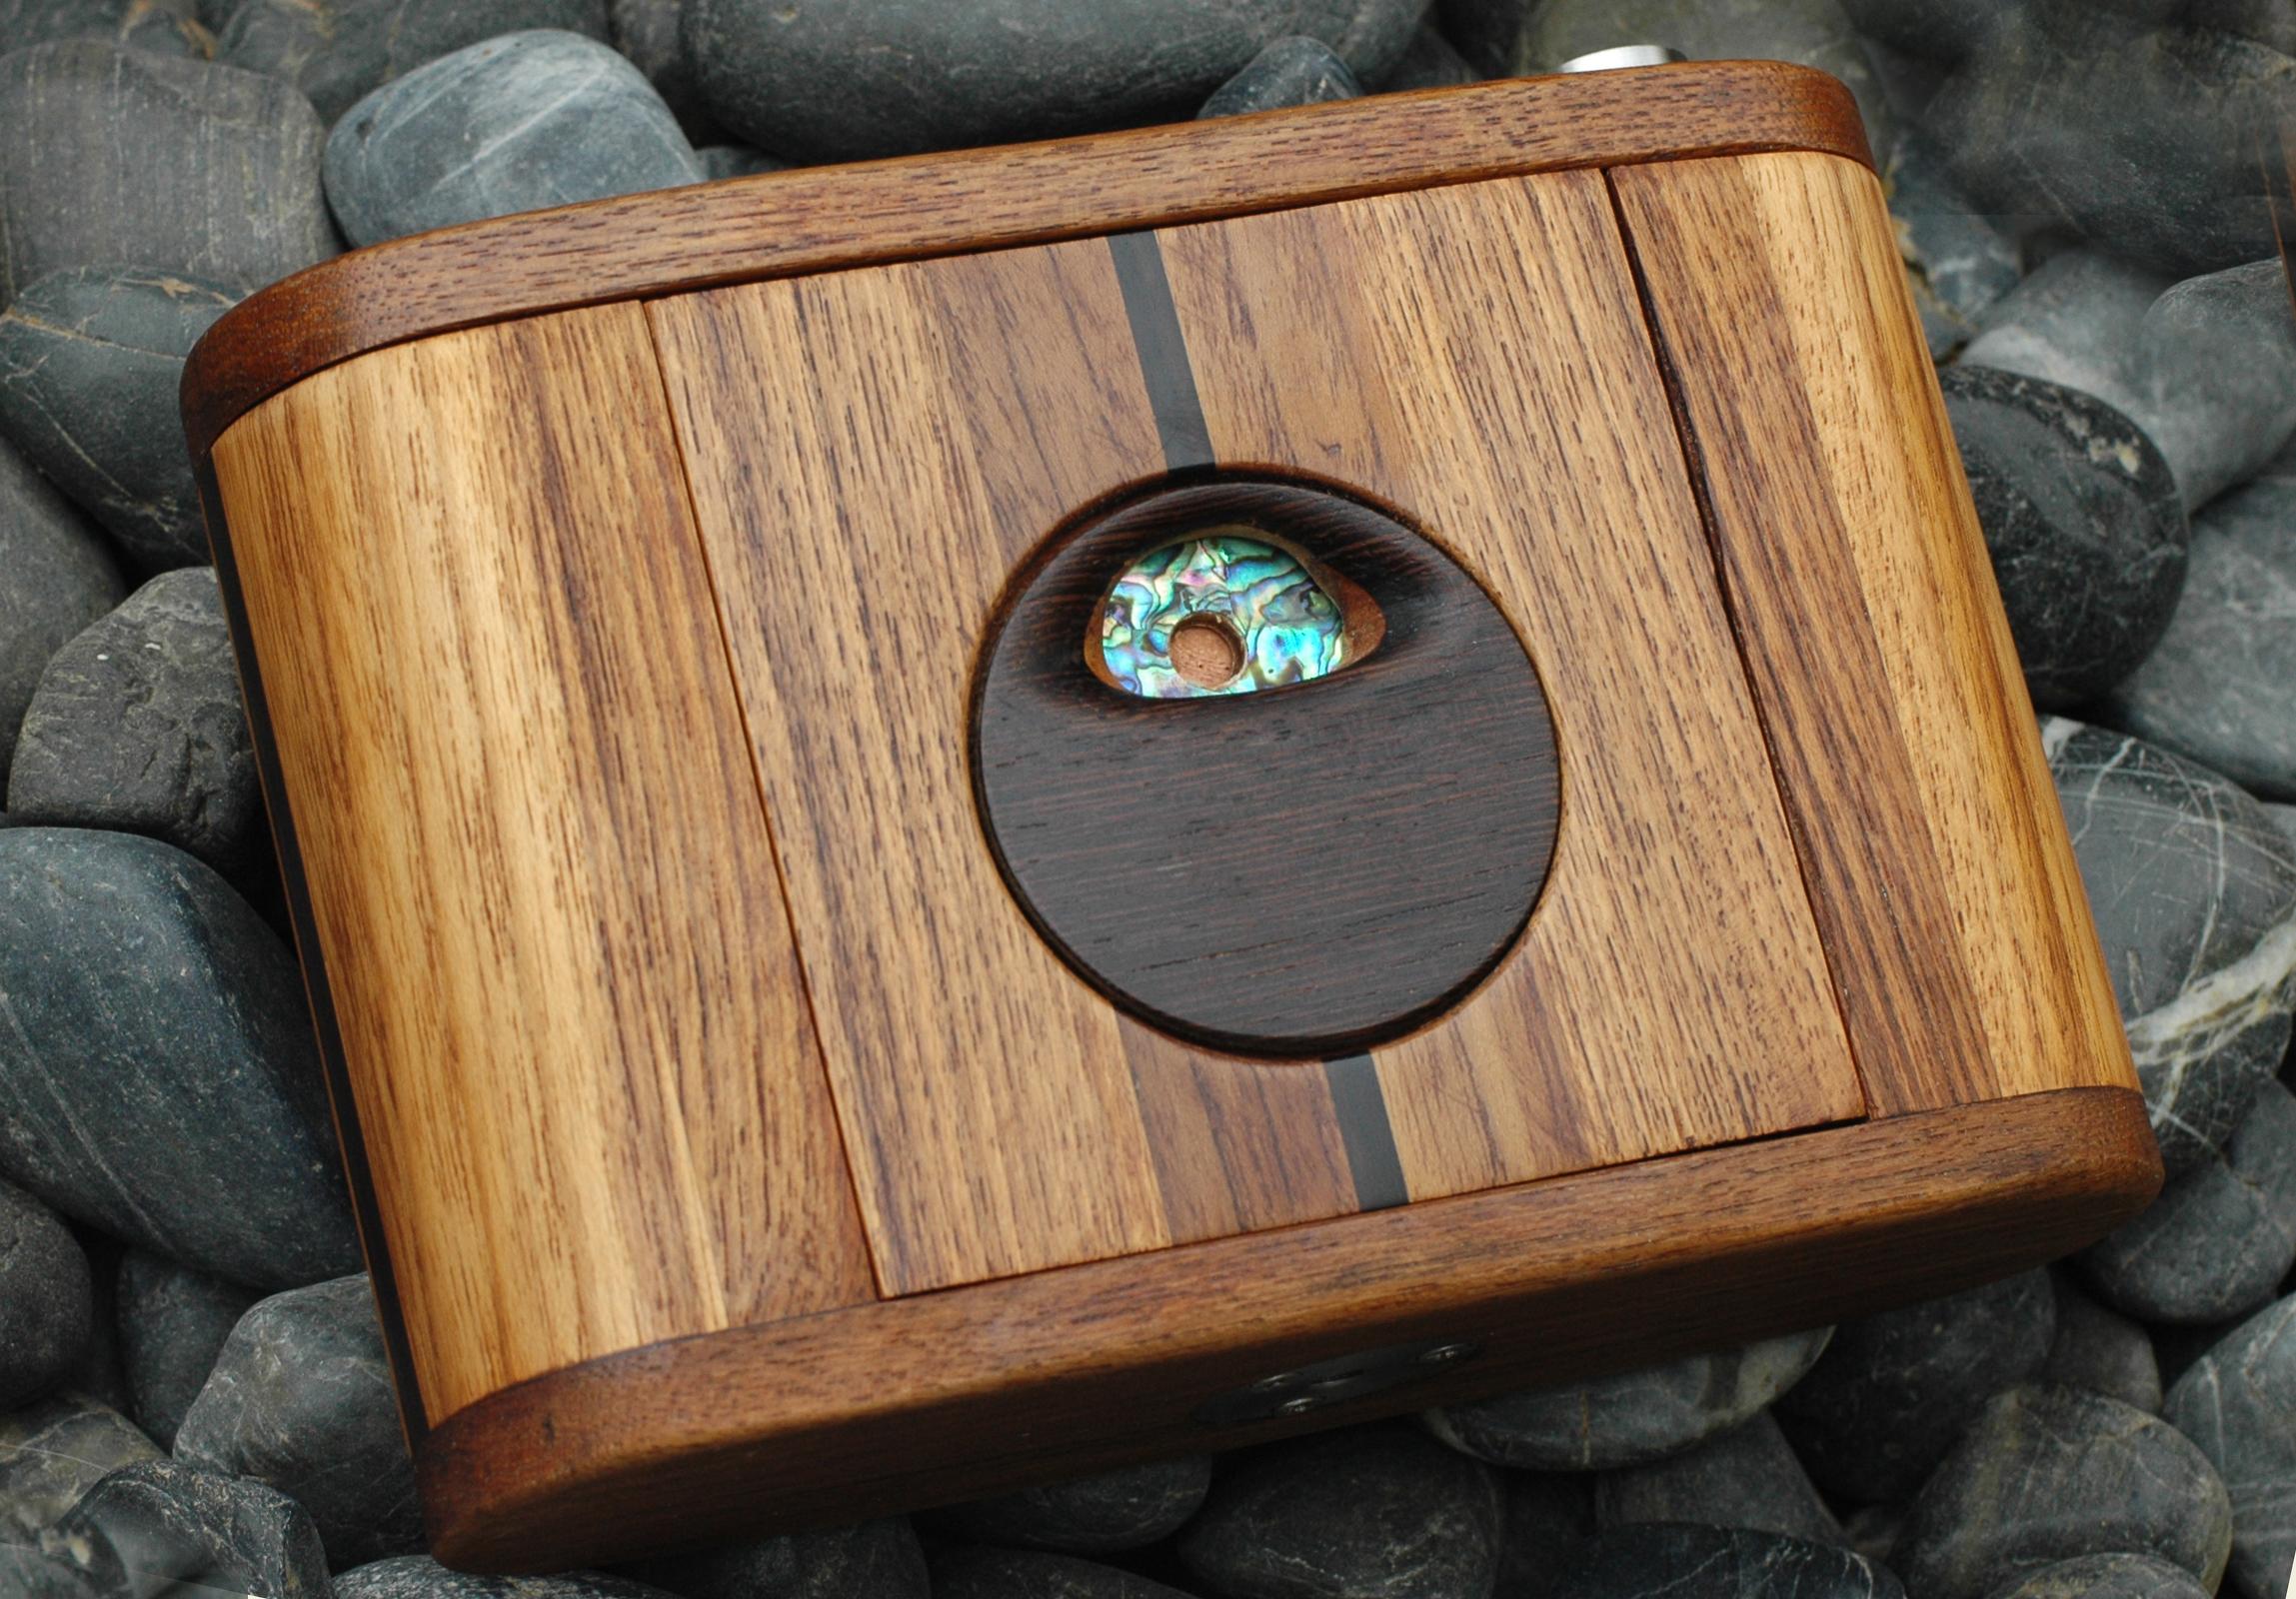 Pinhole Camera Chamaeleon Panorama 6x9-2 #119 - skink pinhole